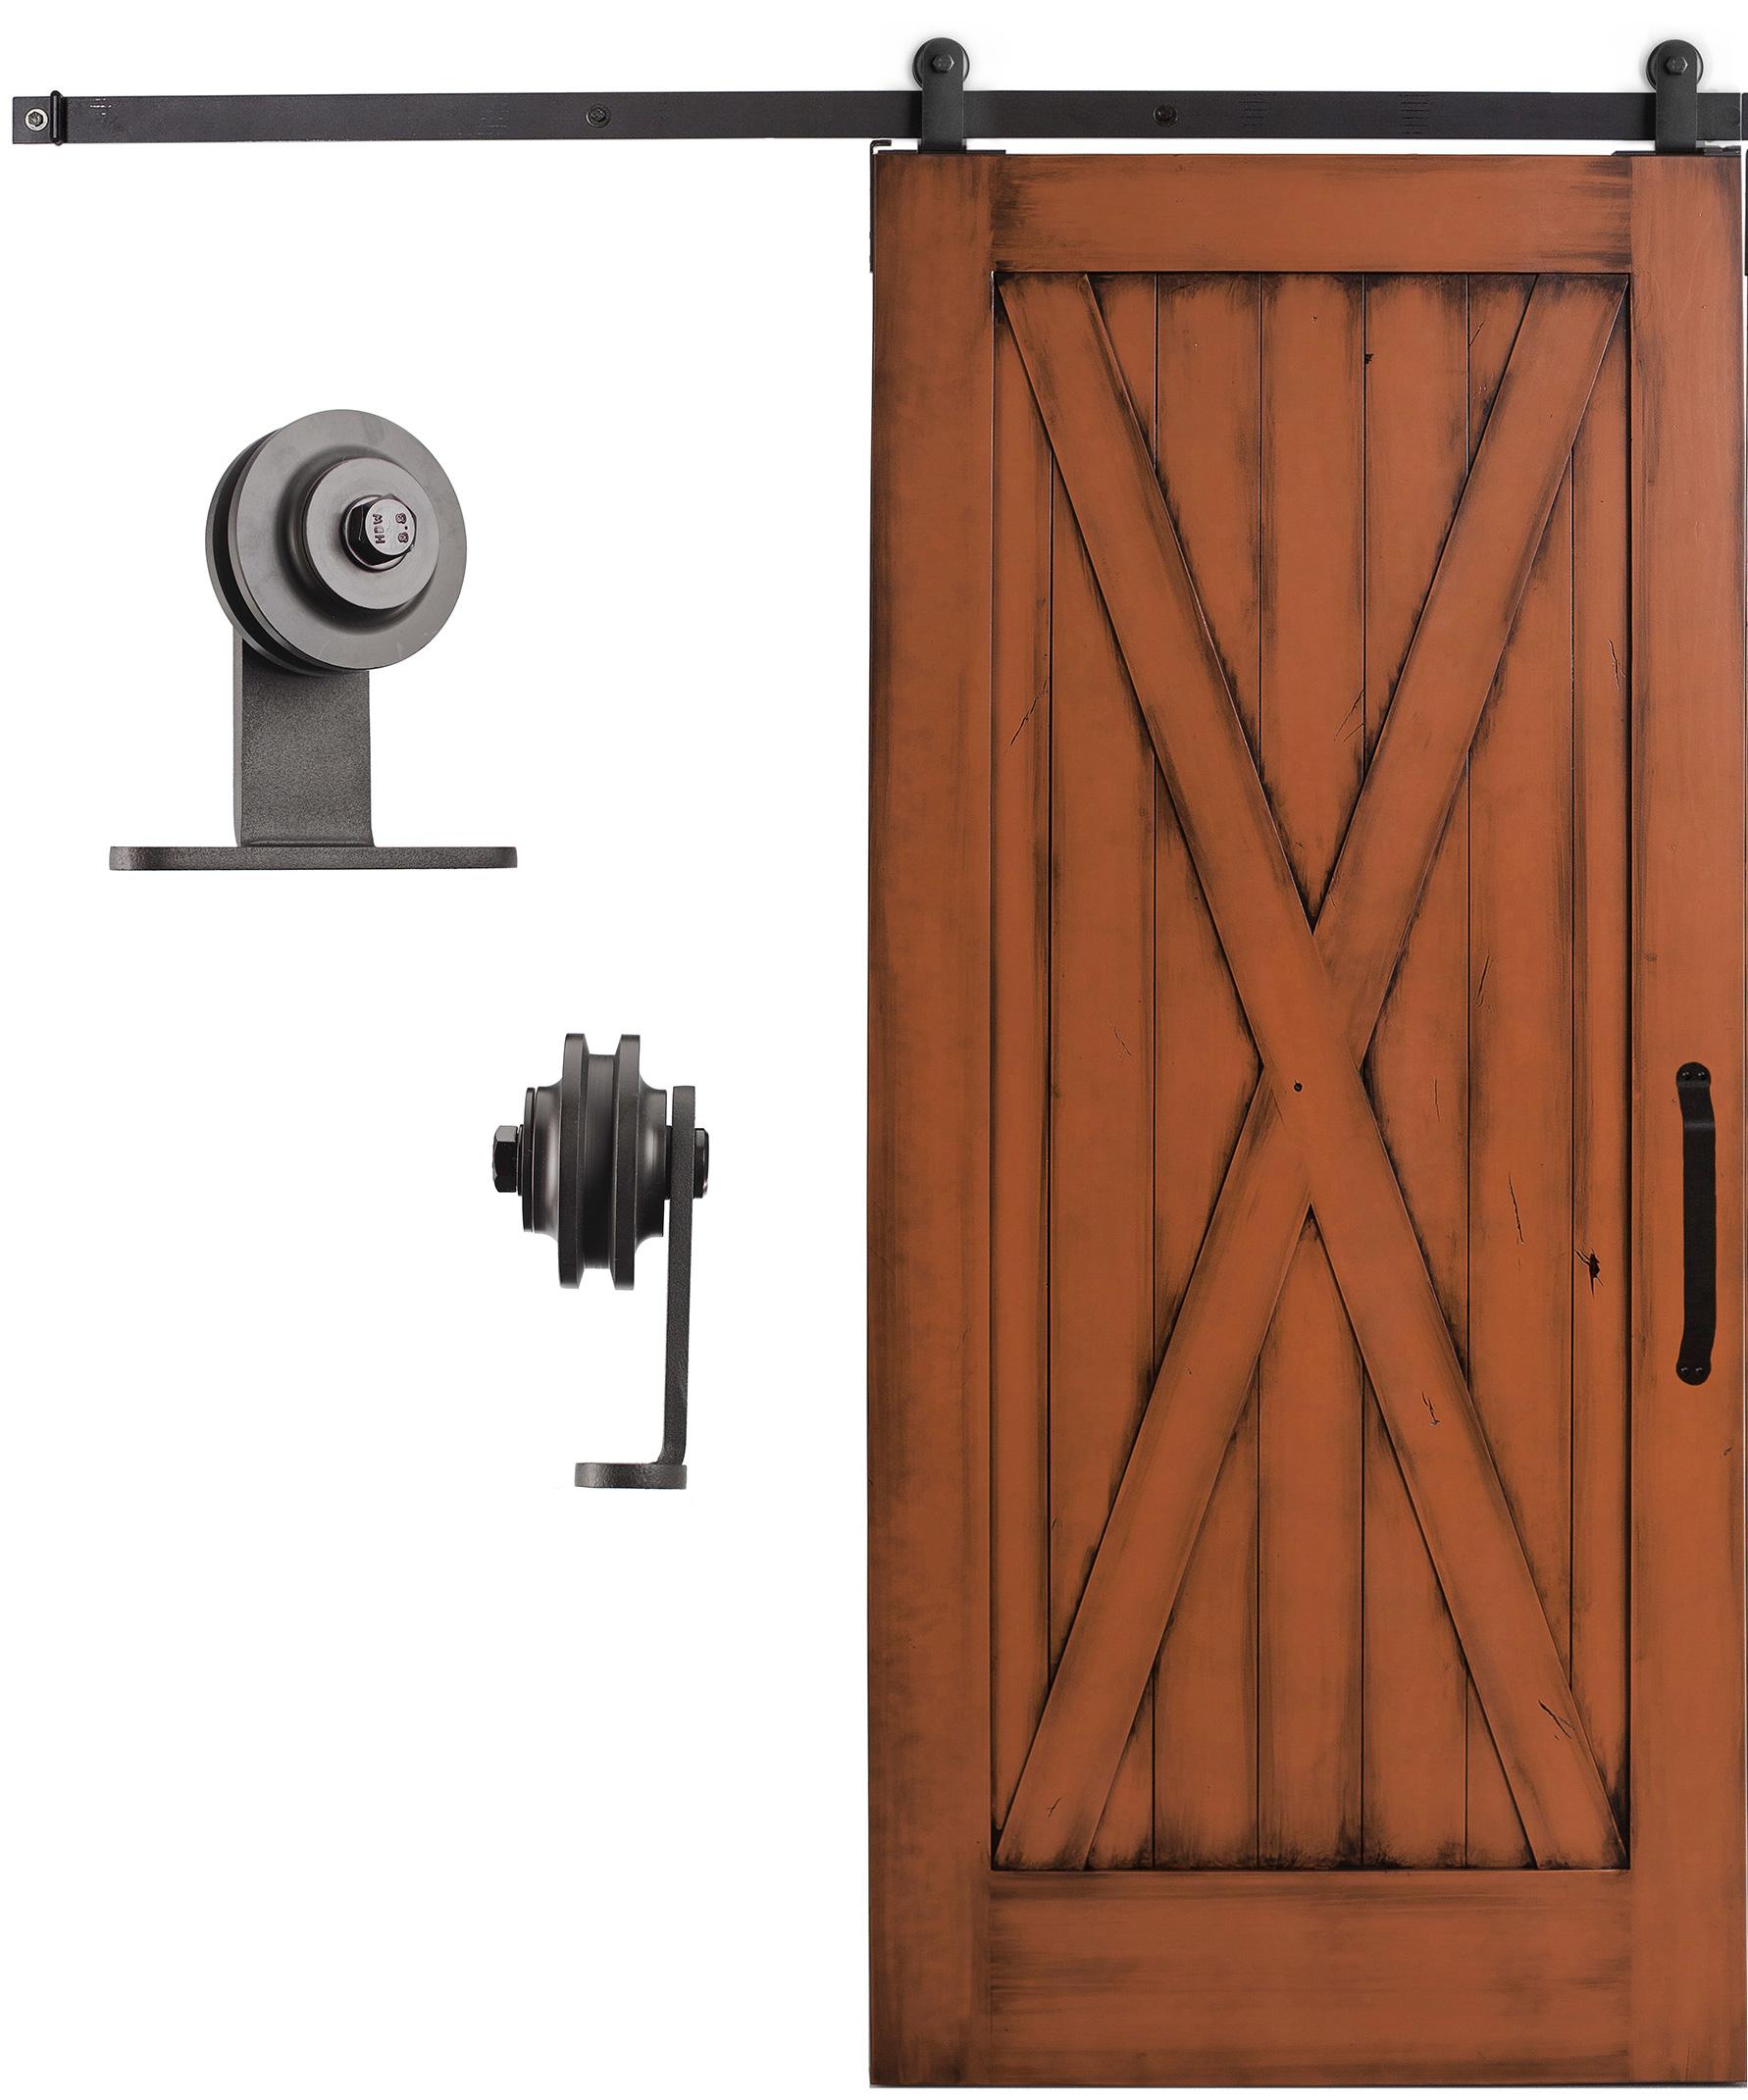 Sliding cabinet barn door hardware kit 6 6 feet steel for Sliding barn door track and rollers